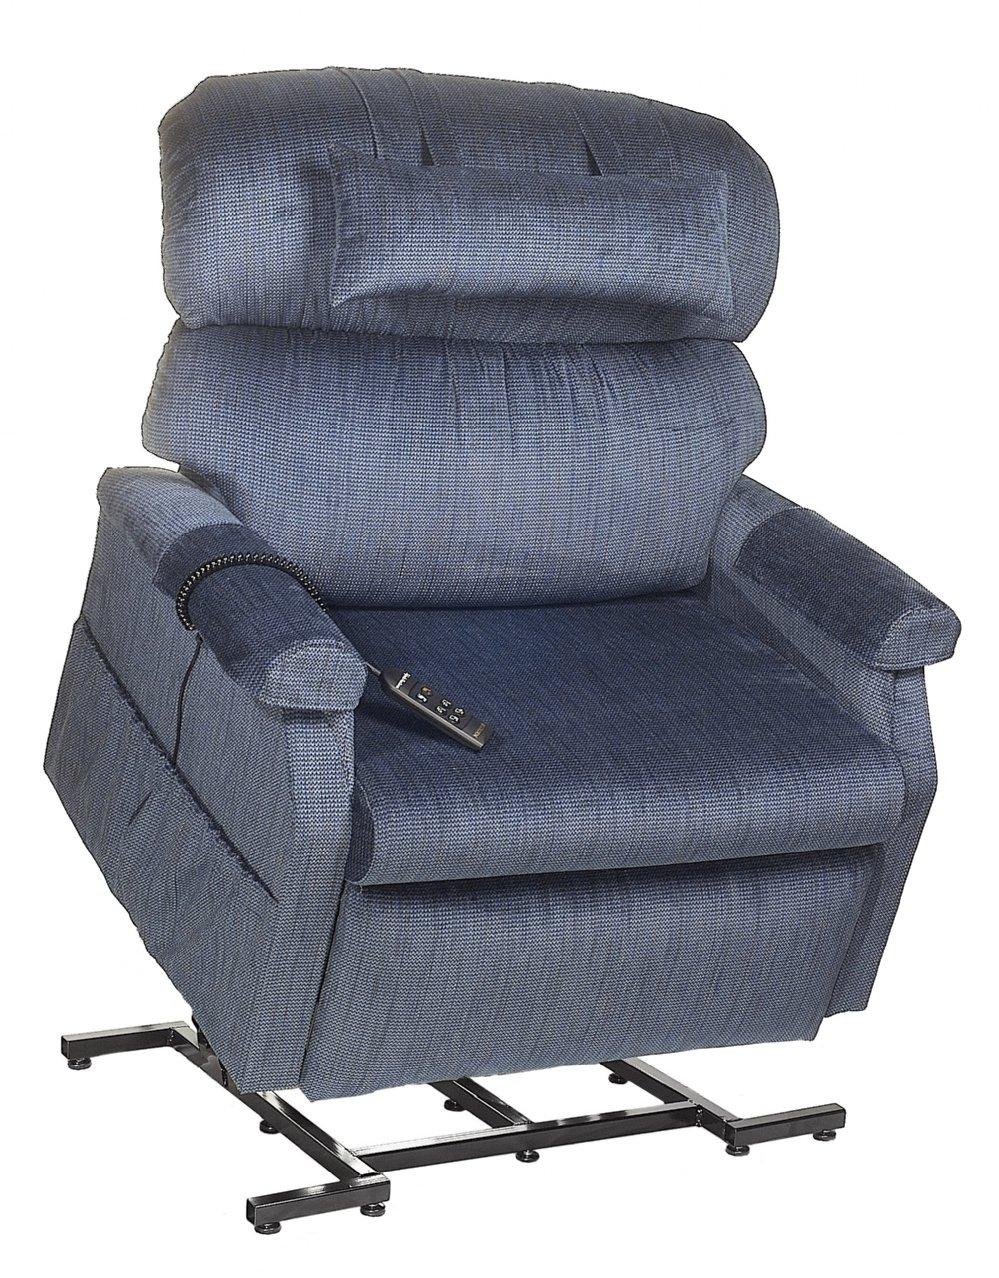 PR502 Golden Lift Chair 33 Seat 700lb PR502